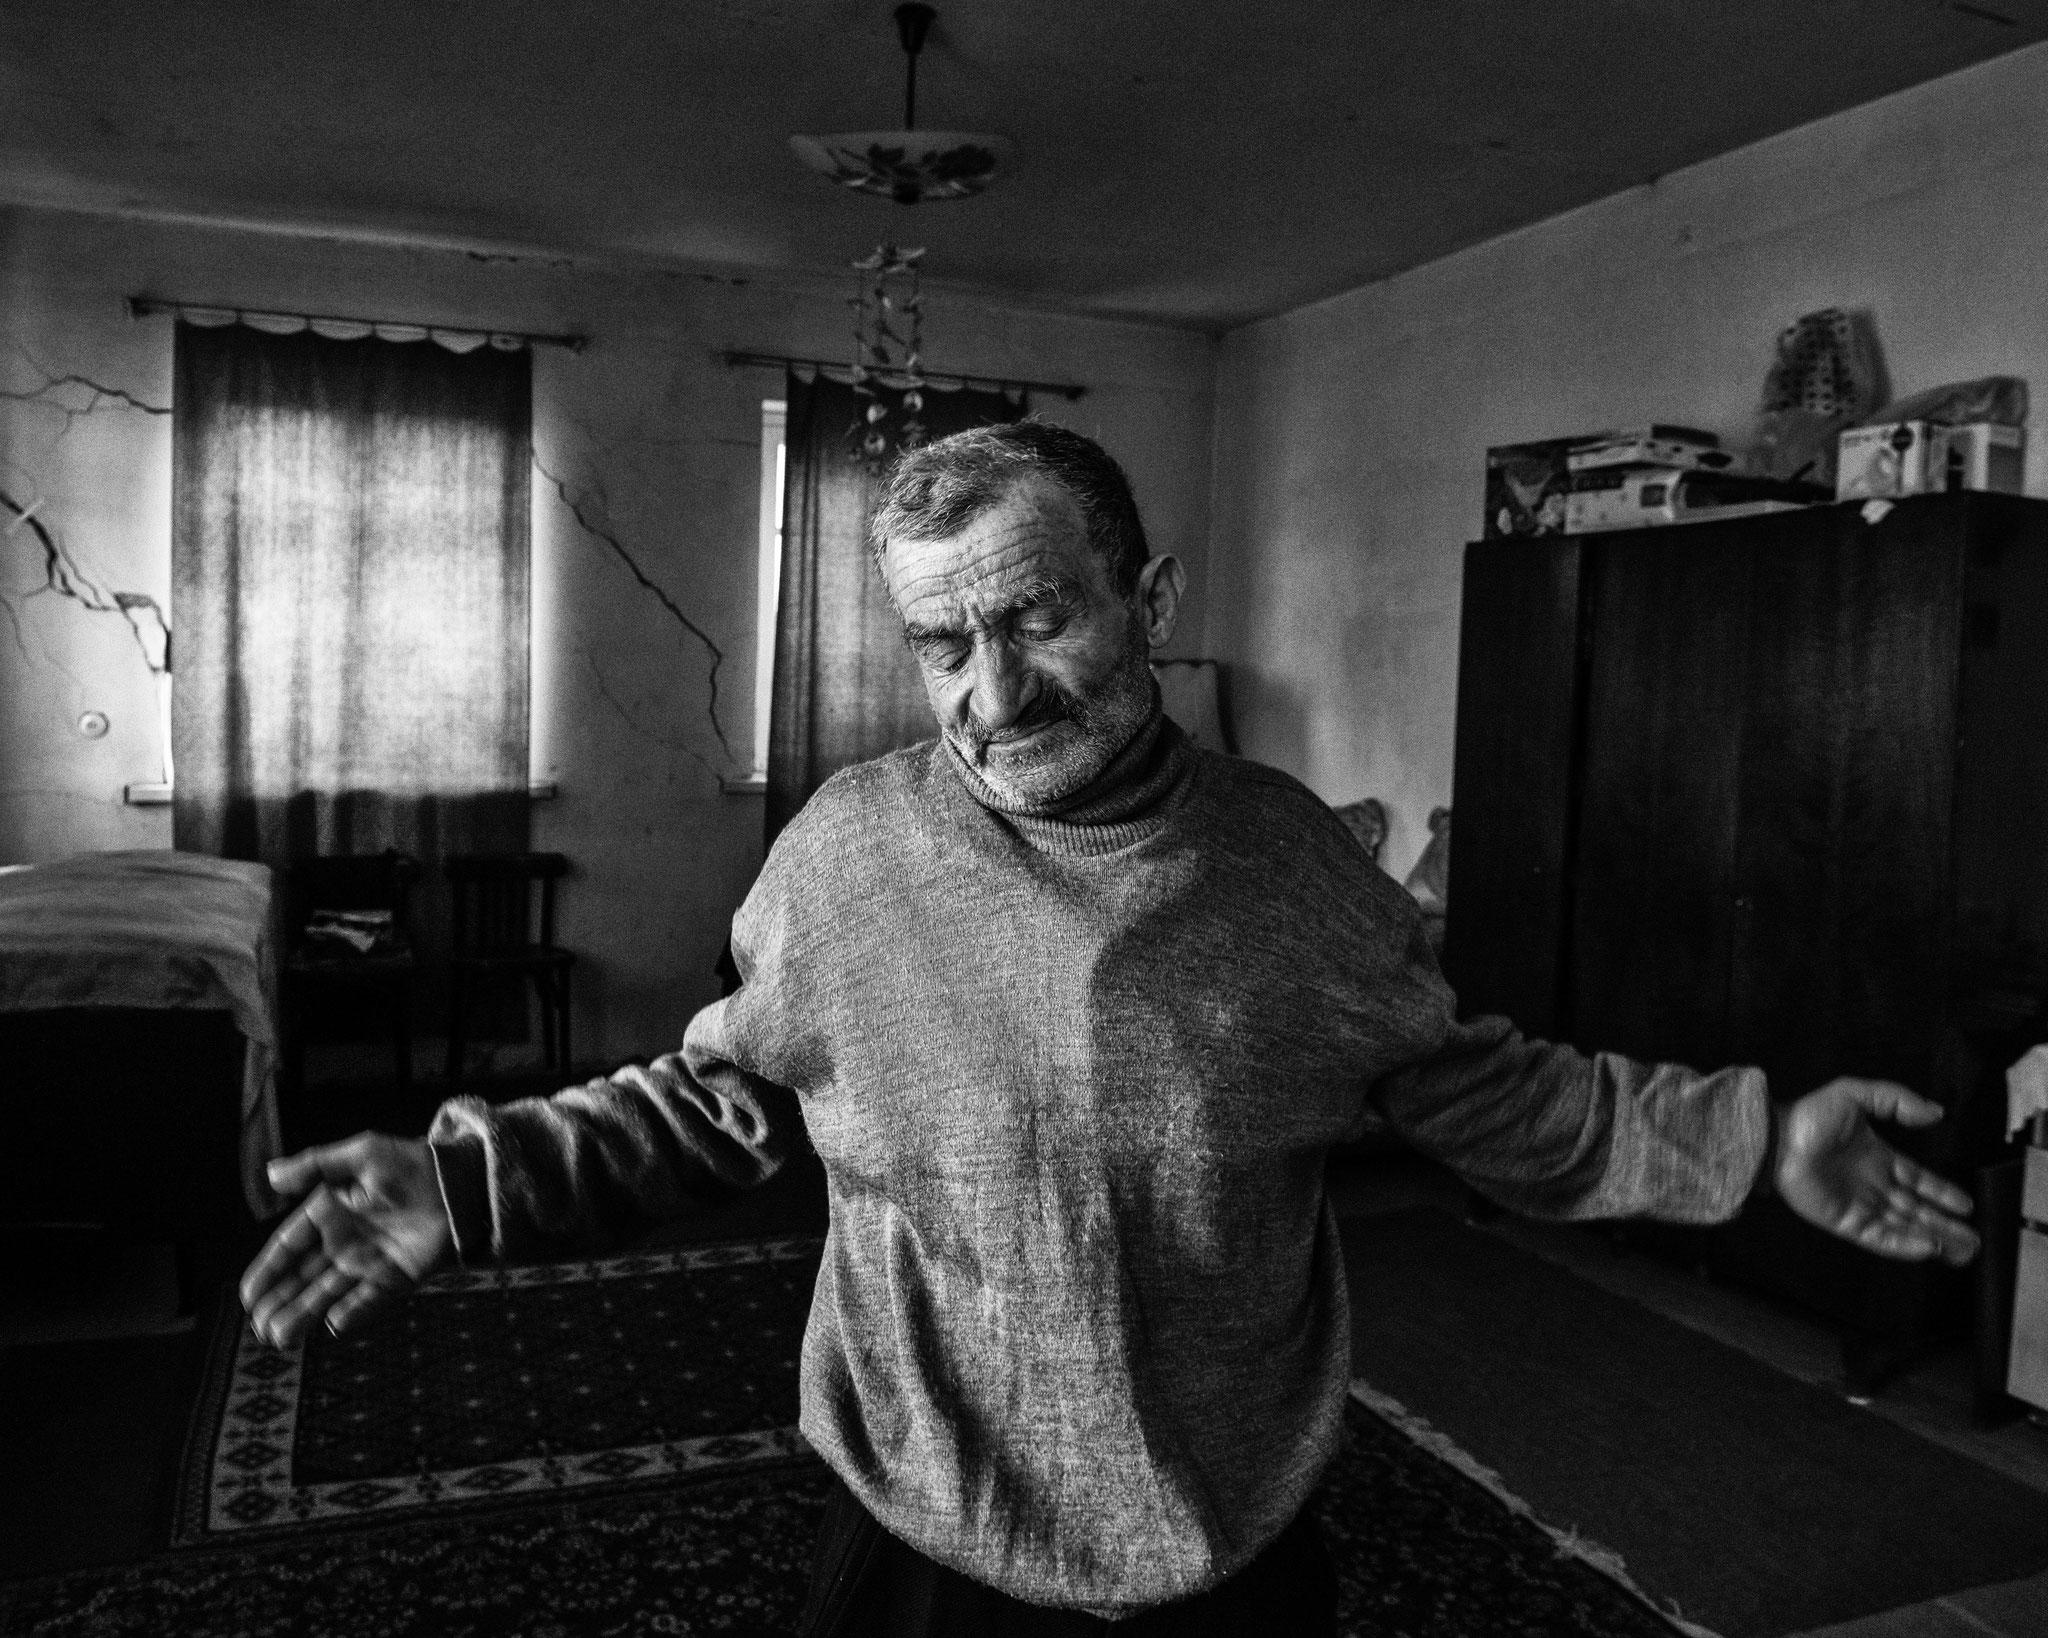 Refugee from AZ; Sos/Nagorno Karabakh